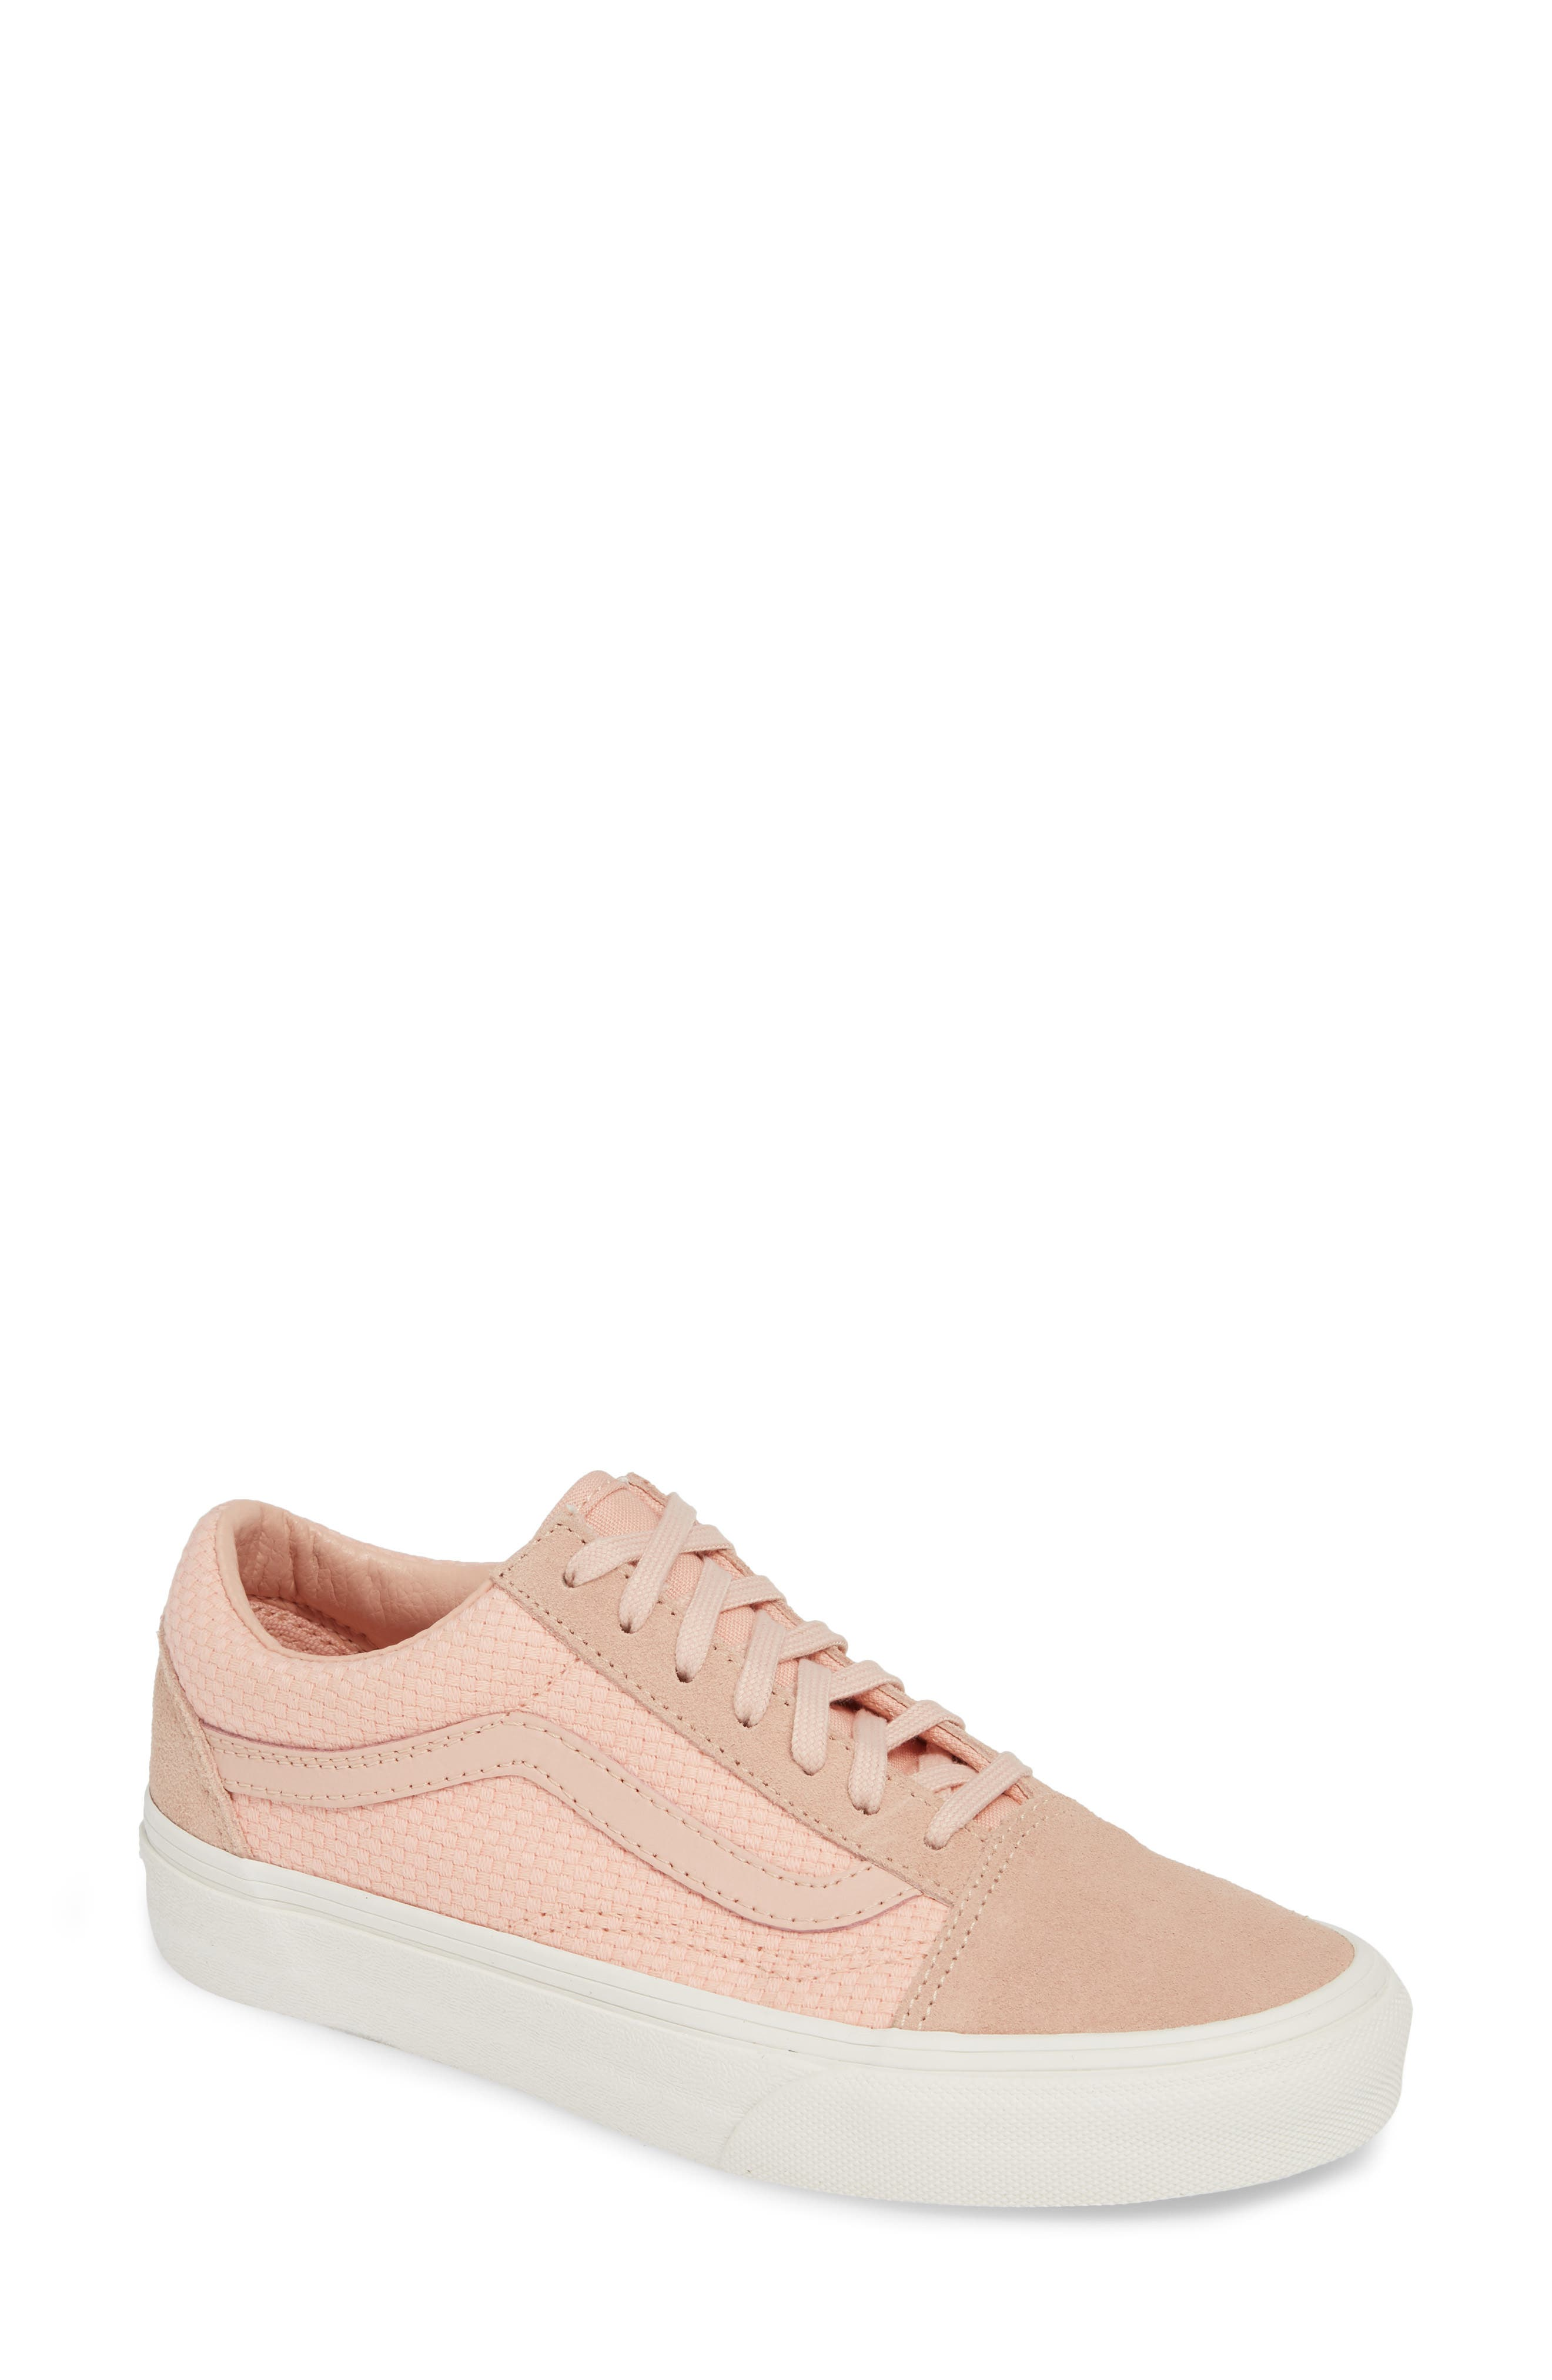 VANS Old Skool Woven Check Sneaker, Main, color, SPANISH VILLA/ SNOW WHITE